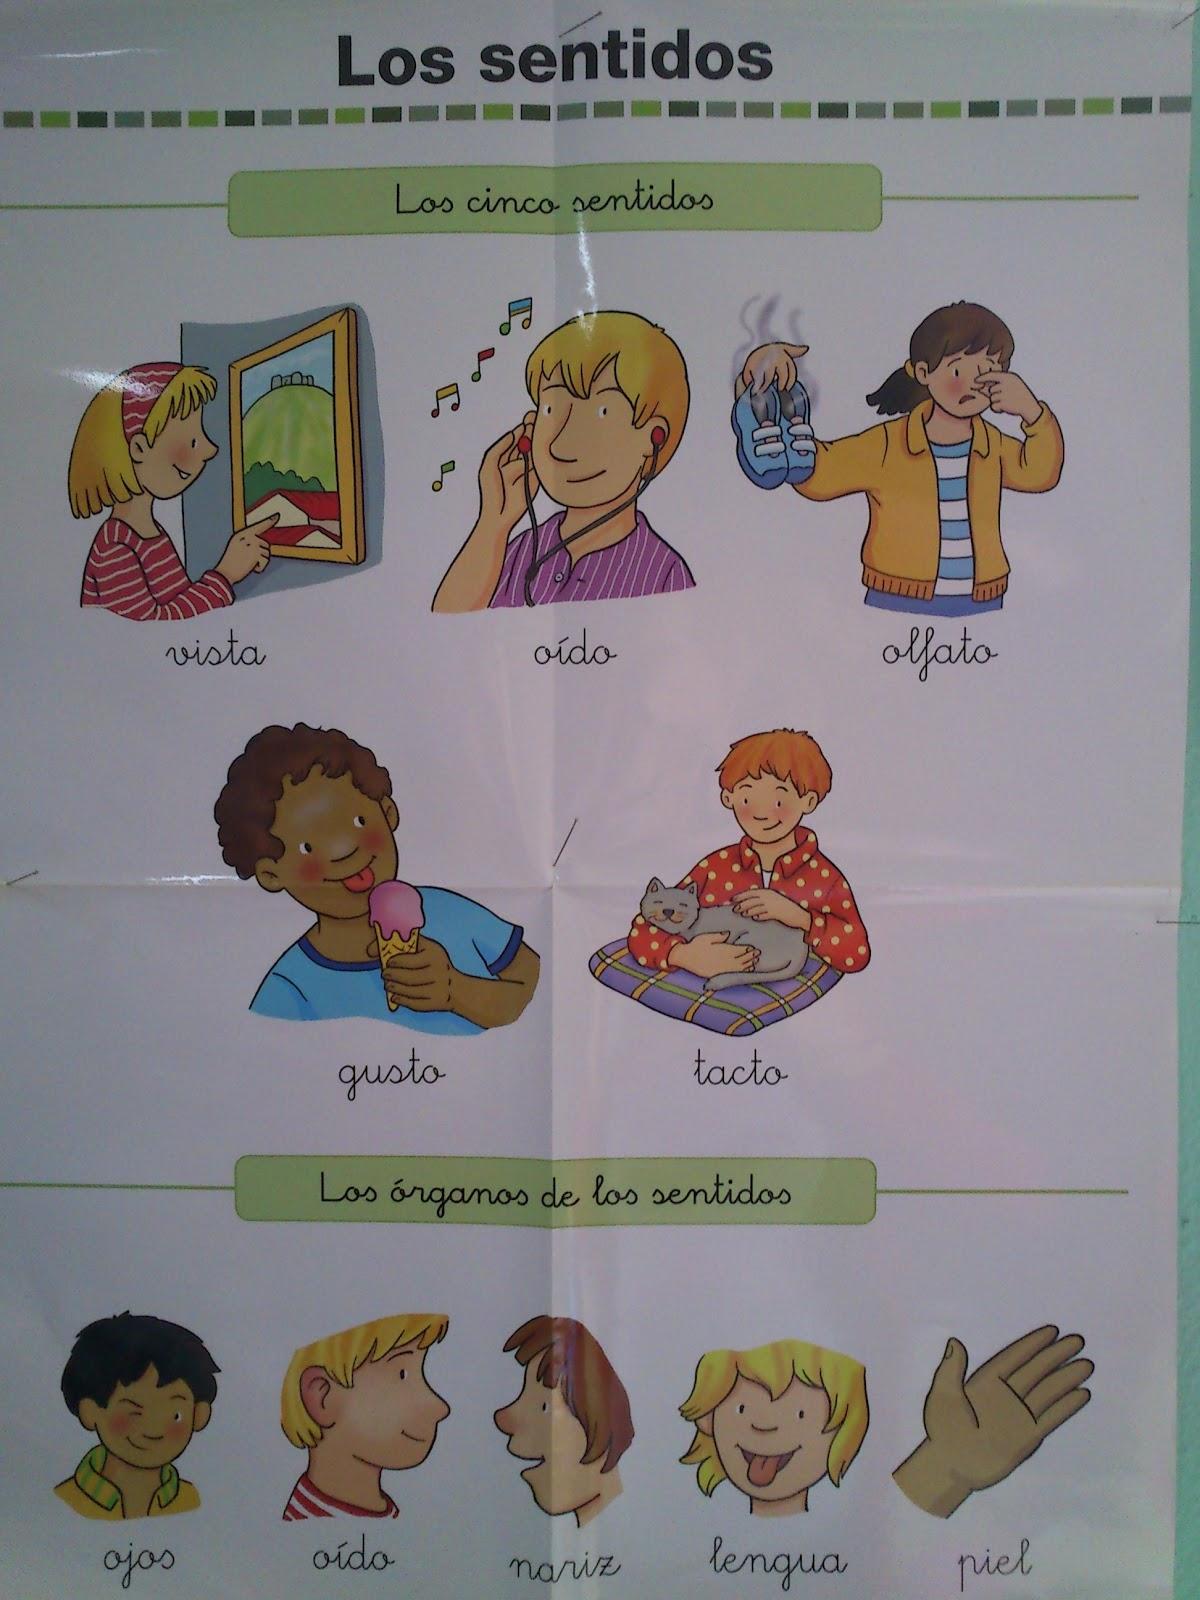 Ingl s con la se o teacher silvia noviembre 2012 for Mural de los 5 sentidos